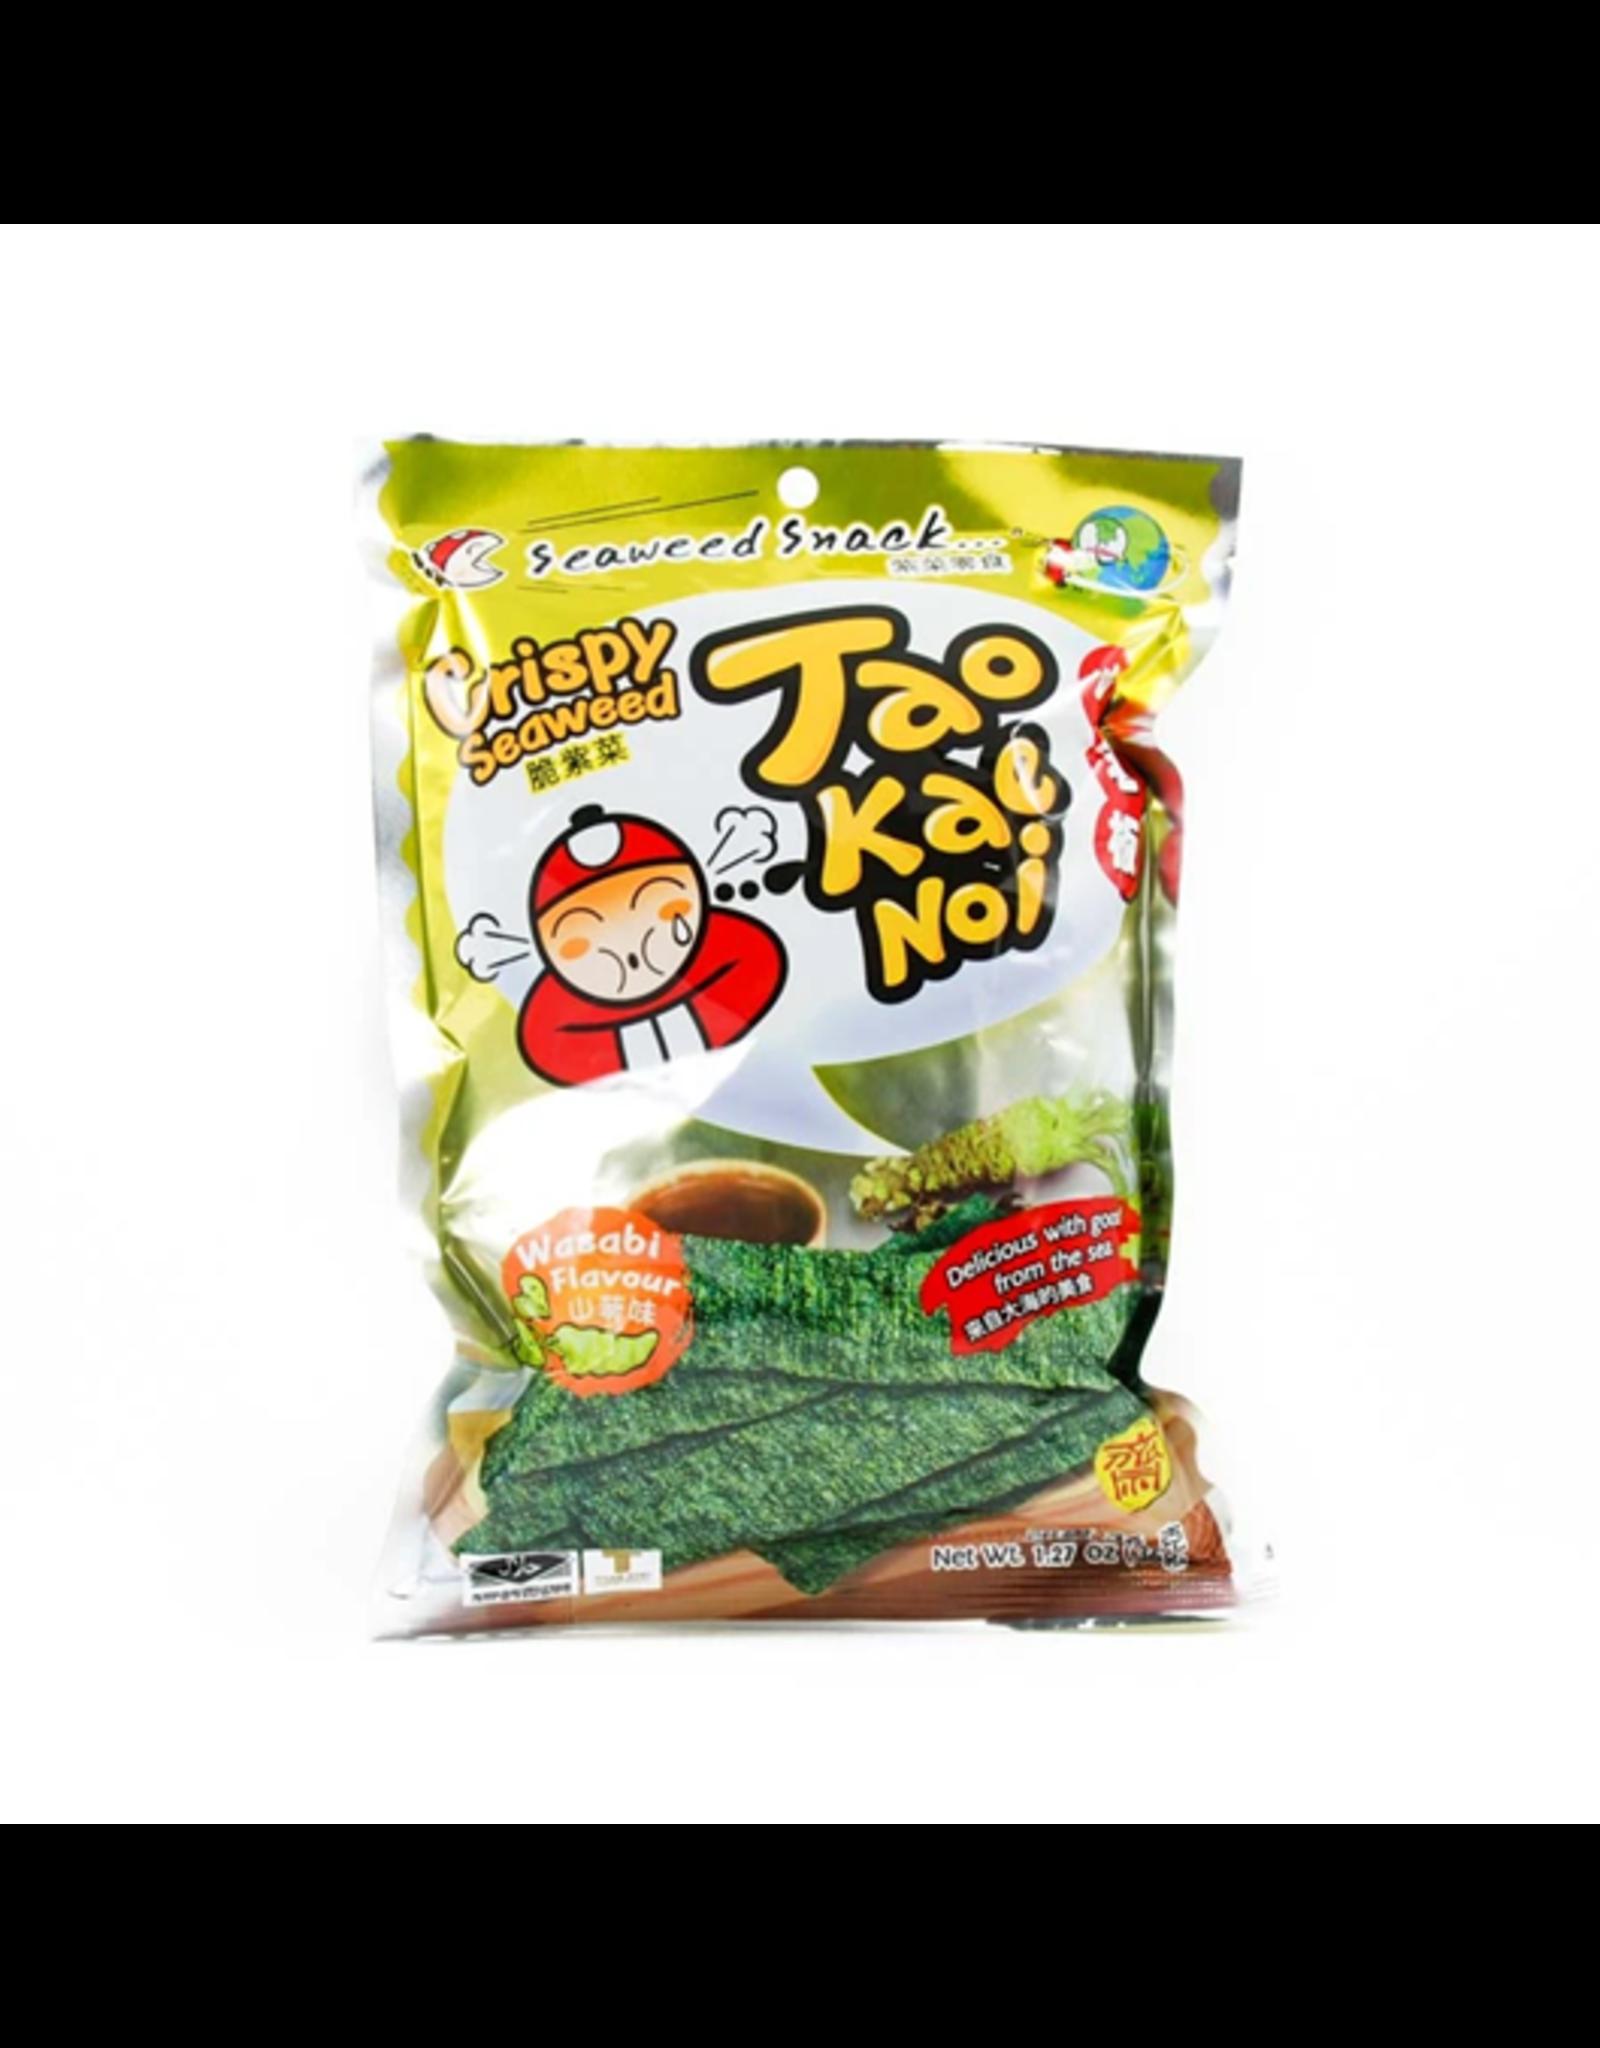 Tao Kae Noi Crispy Seaweed Wasabi Value Package